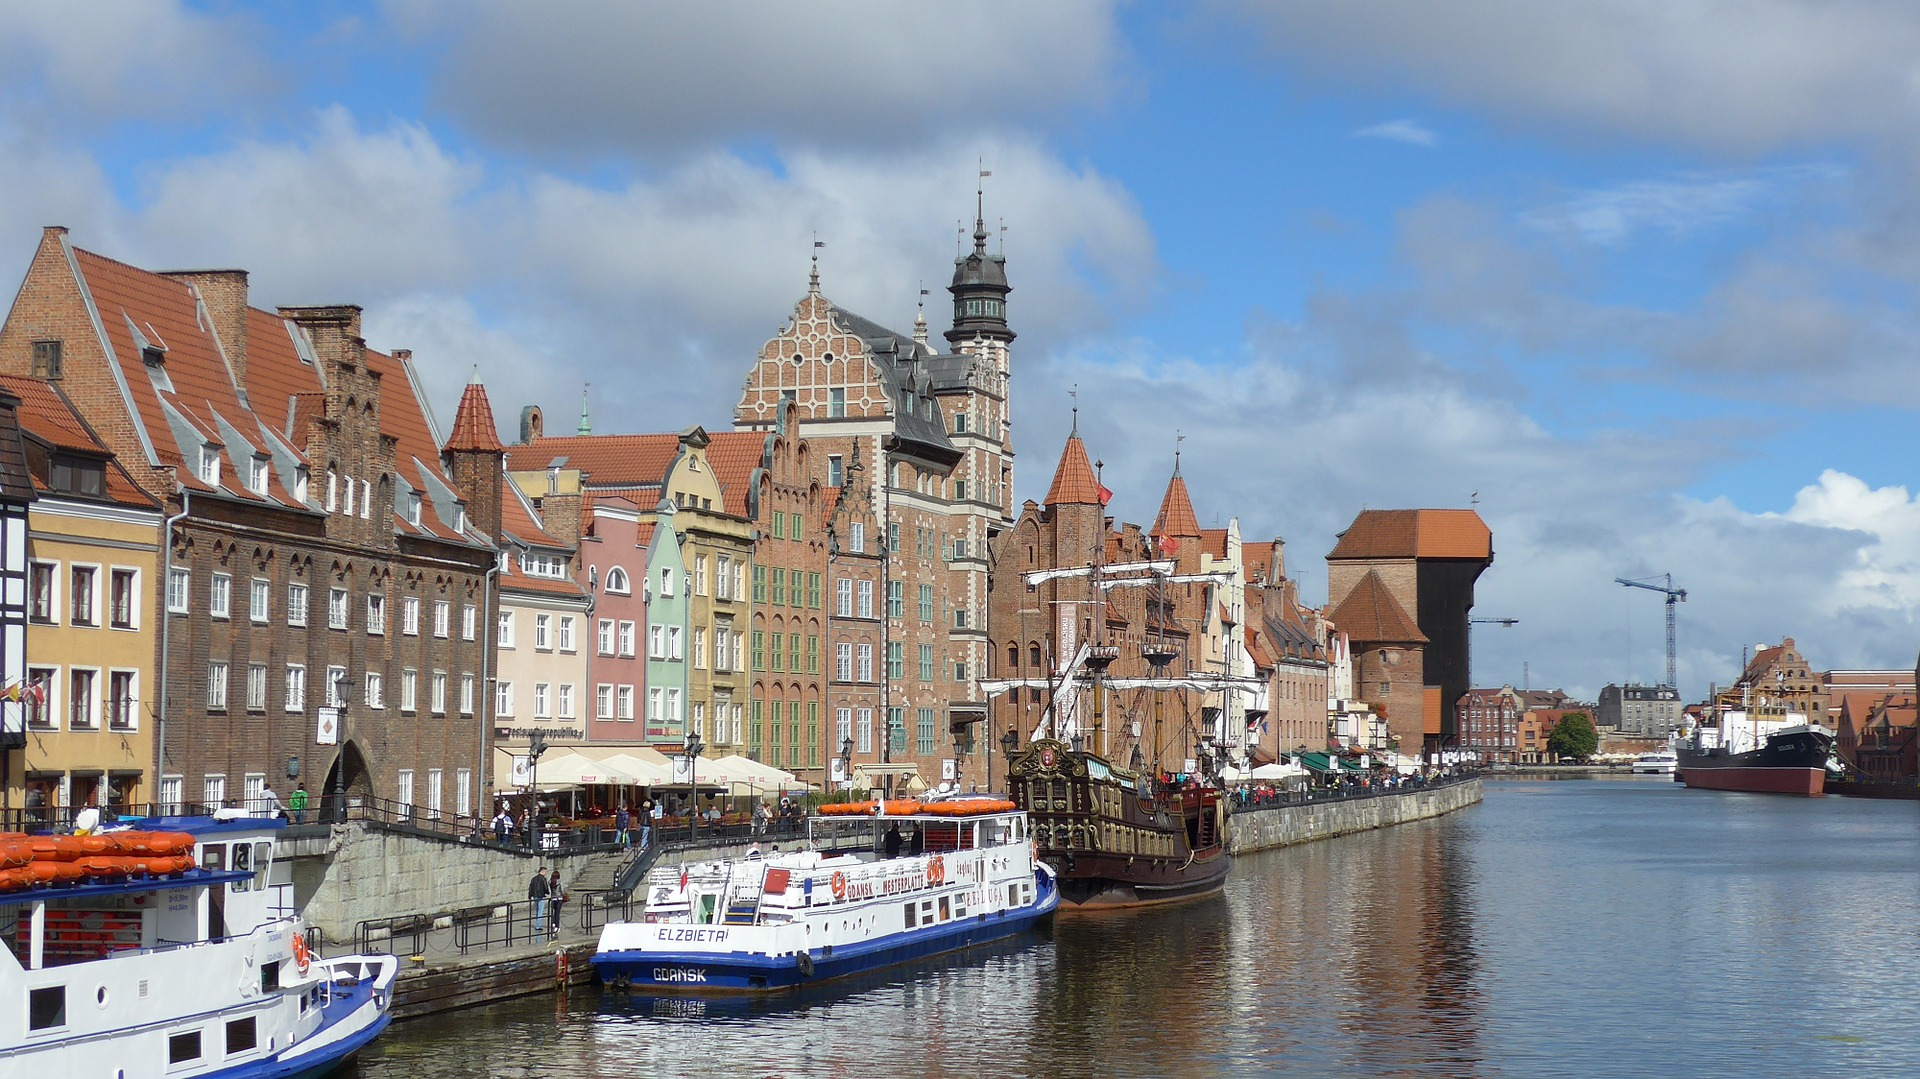 gdansk-1044857_1920.jpg